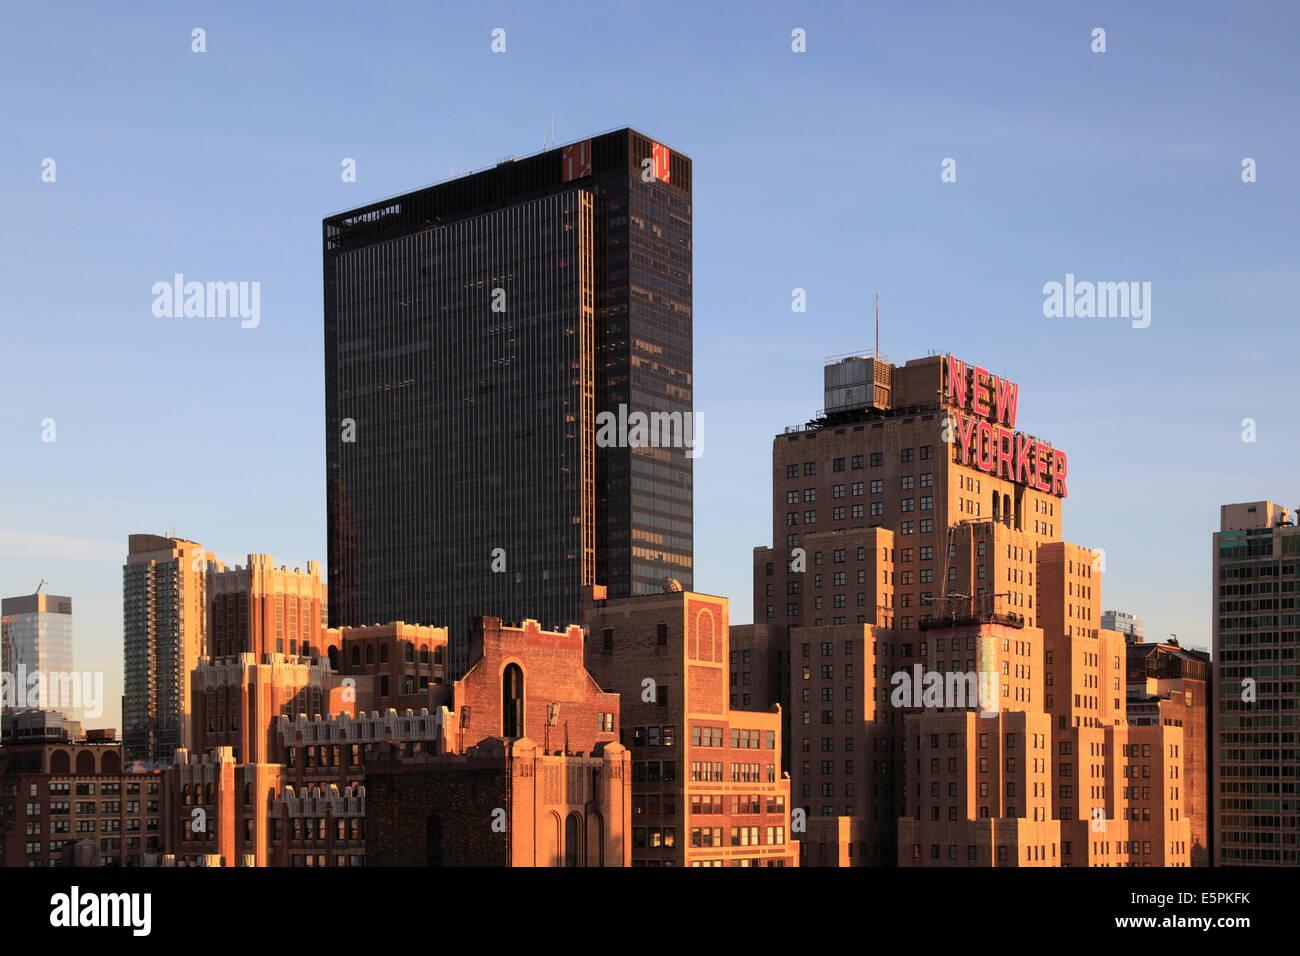 Madison Square Garden On Left New Yorker Hotel Midtown Skyline Stock Photo Royalty Free Image